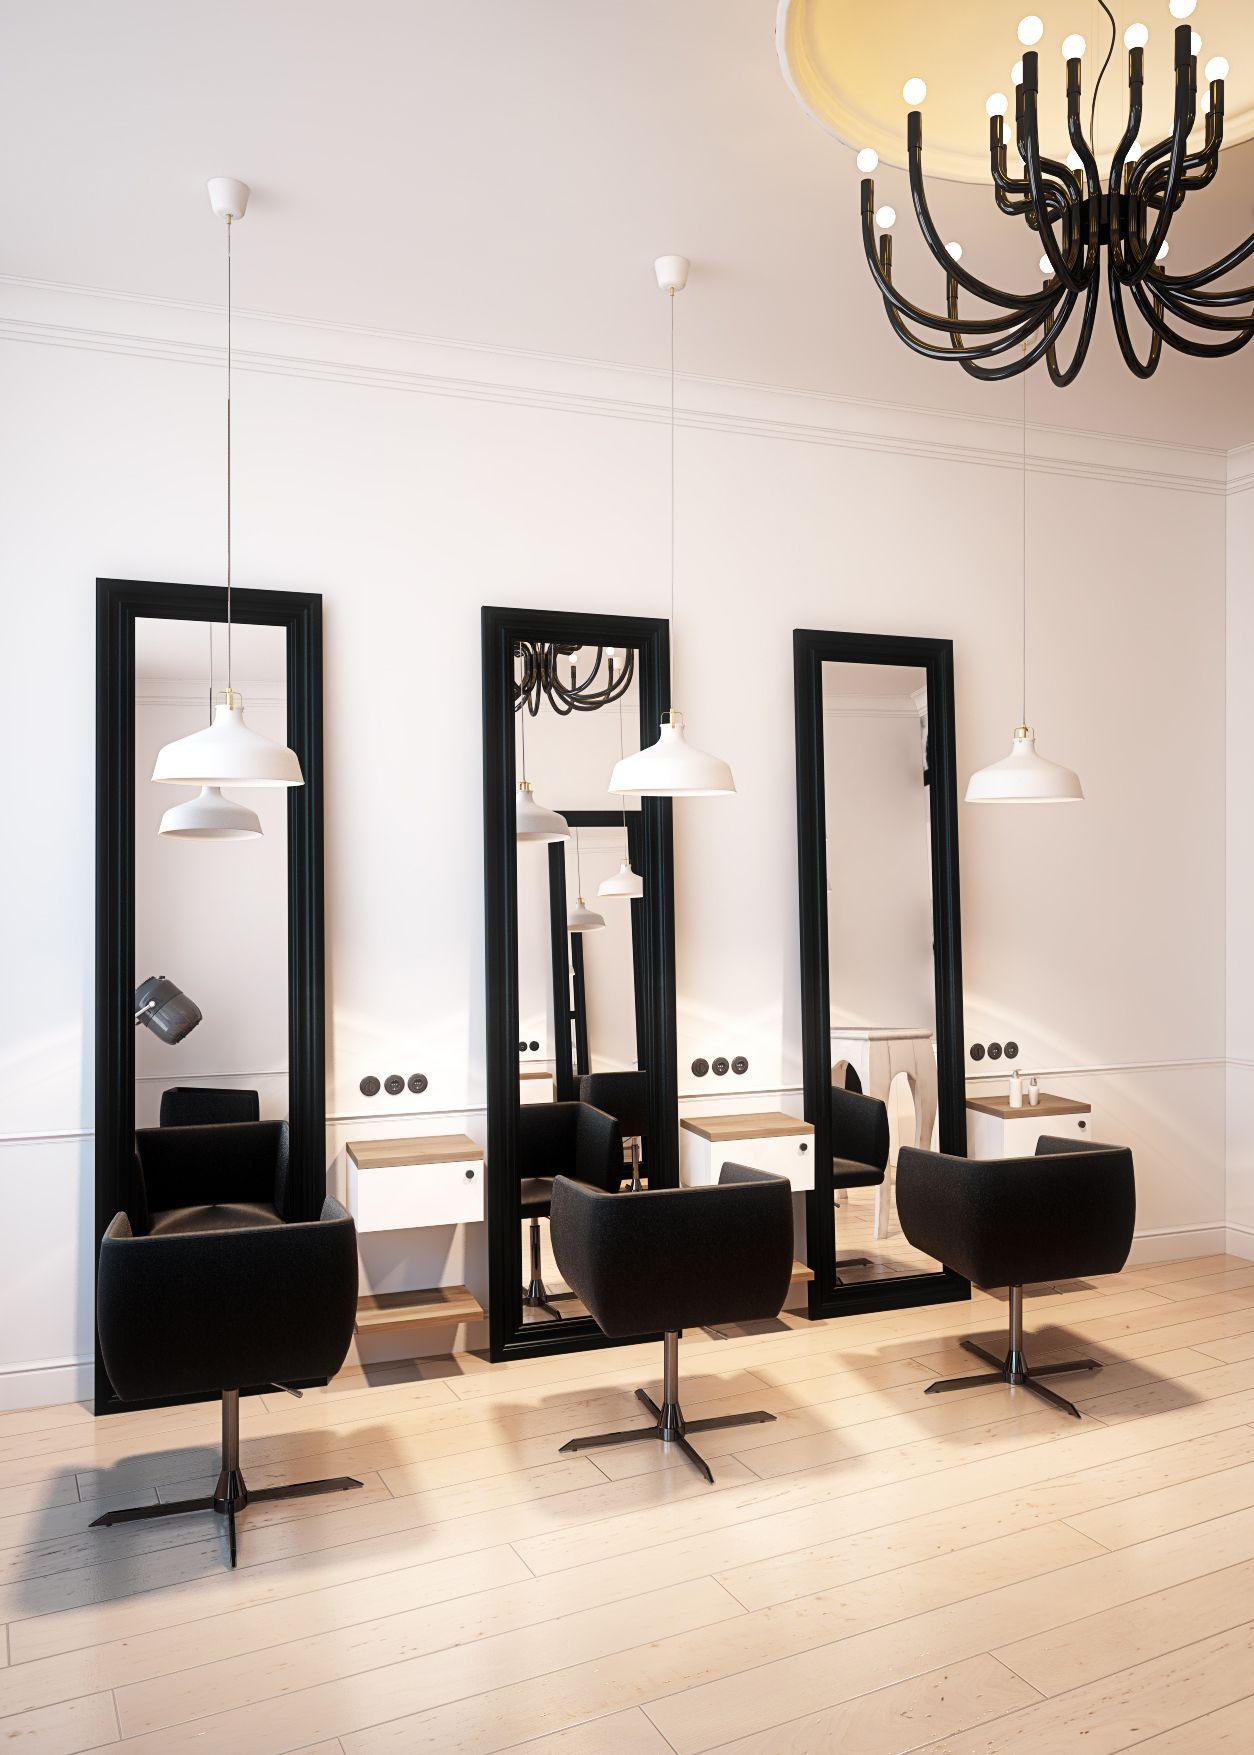 Hairdresser interior design in Bytom POLAND  archi group Salon fryzjerski w Bytomiu